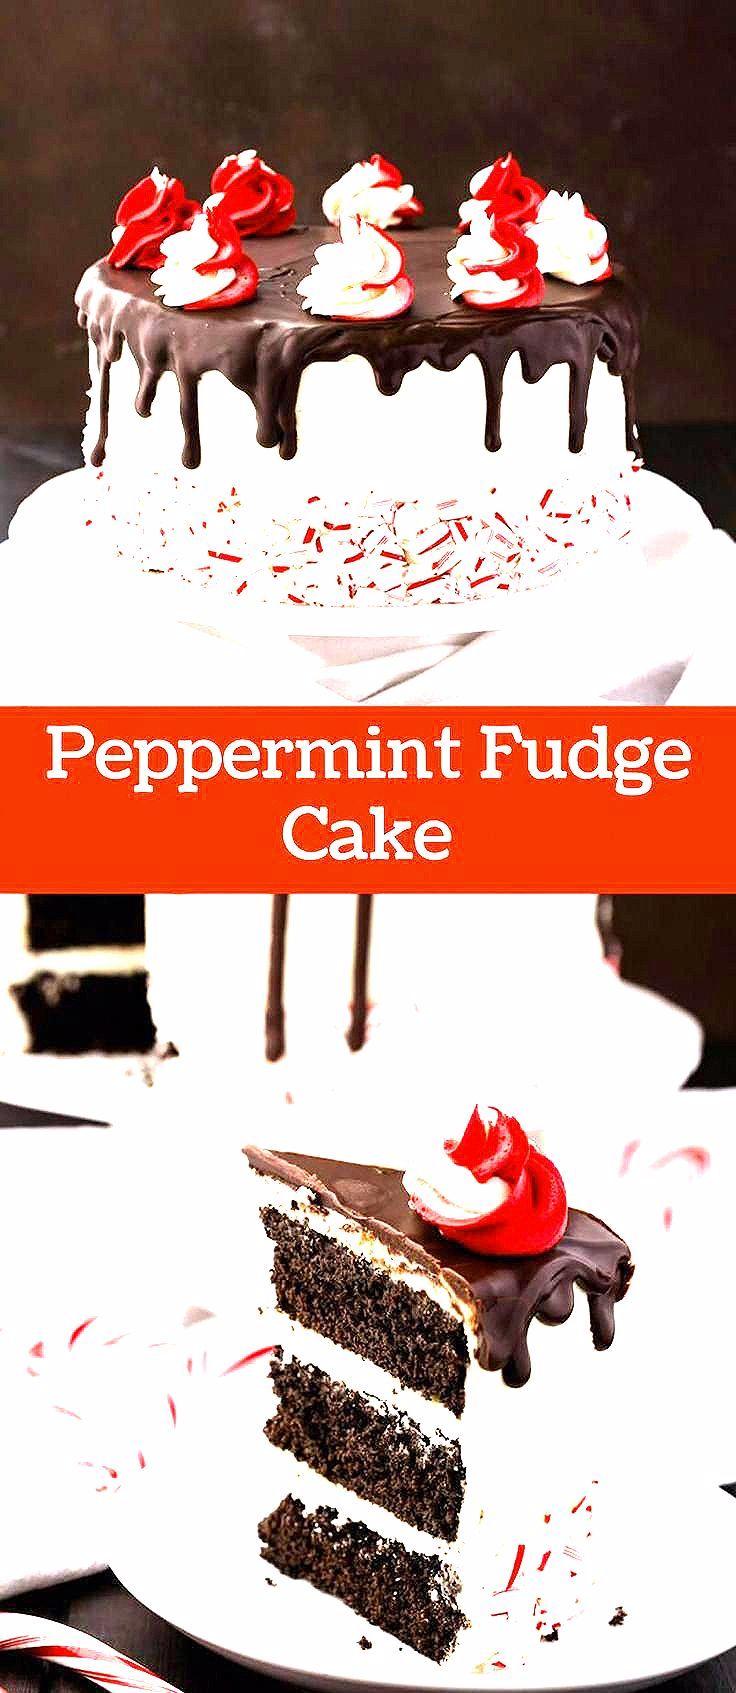 Photo of Peppermint Fudge Cake